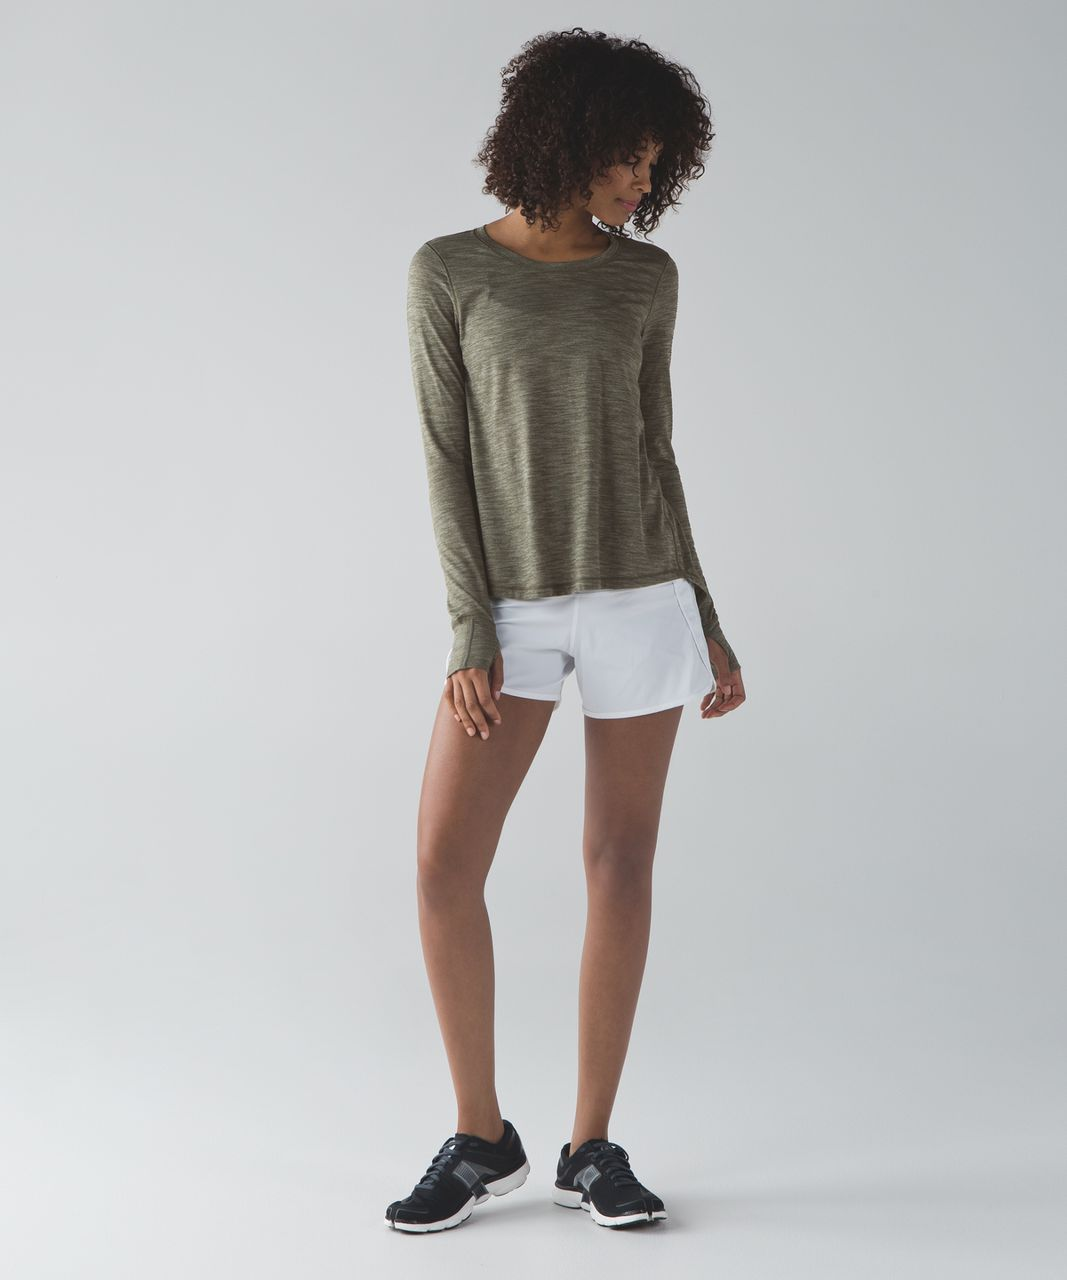 Lululemon Beat The Heat Long Sleeve - Heathered Fatigue Green